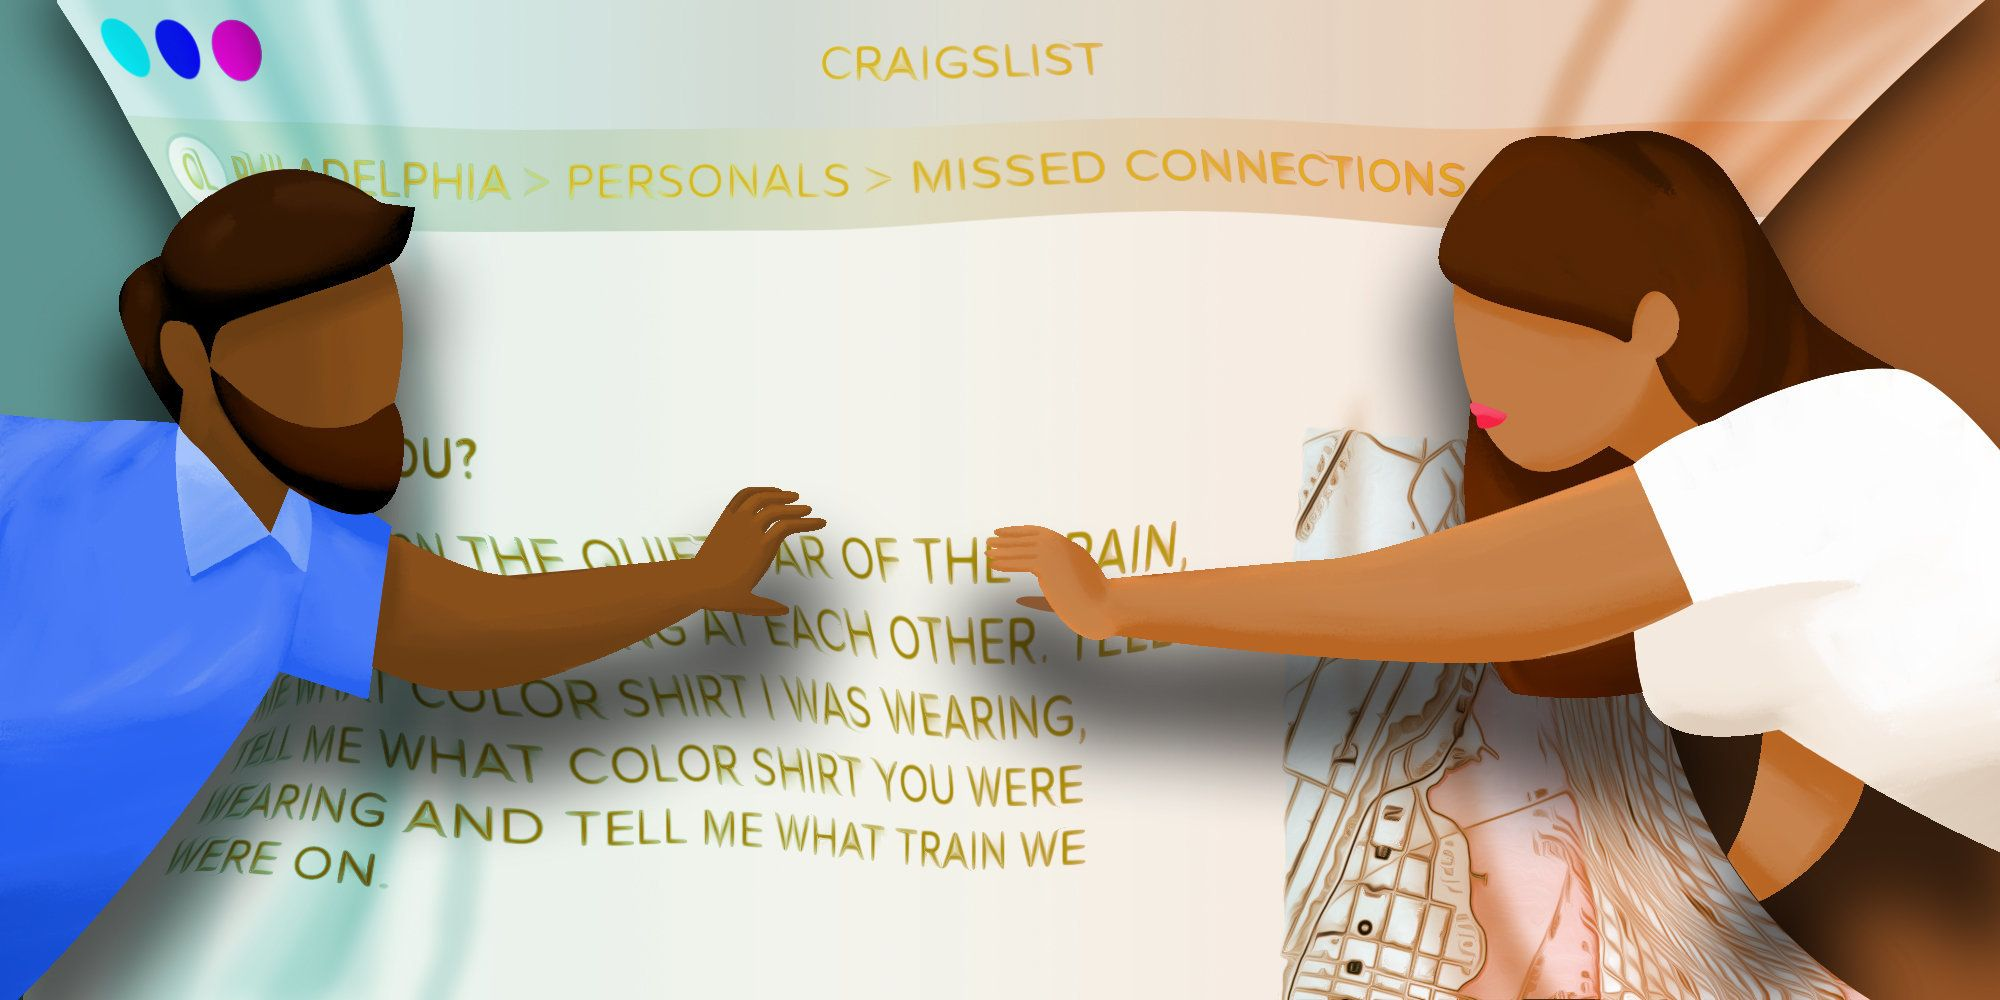 Craigslist personals success stories